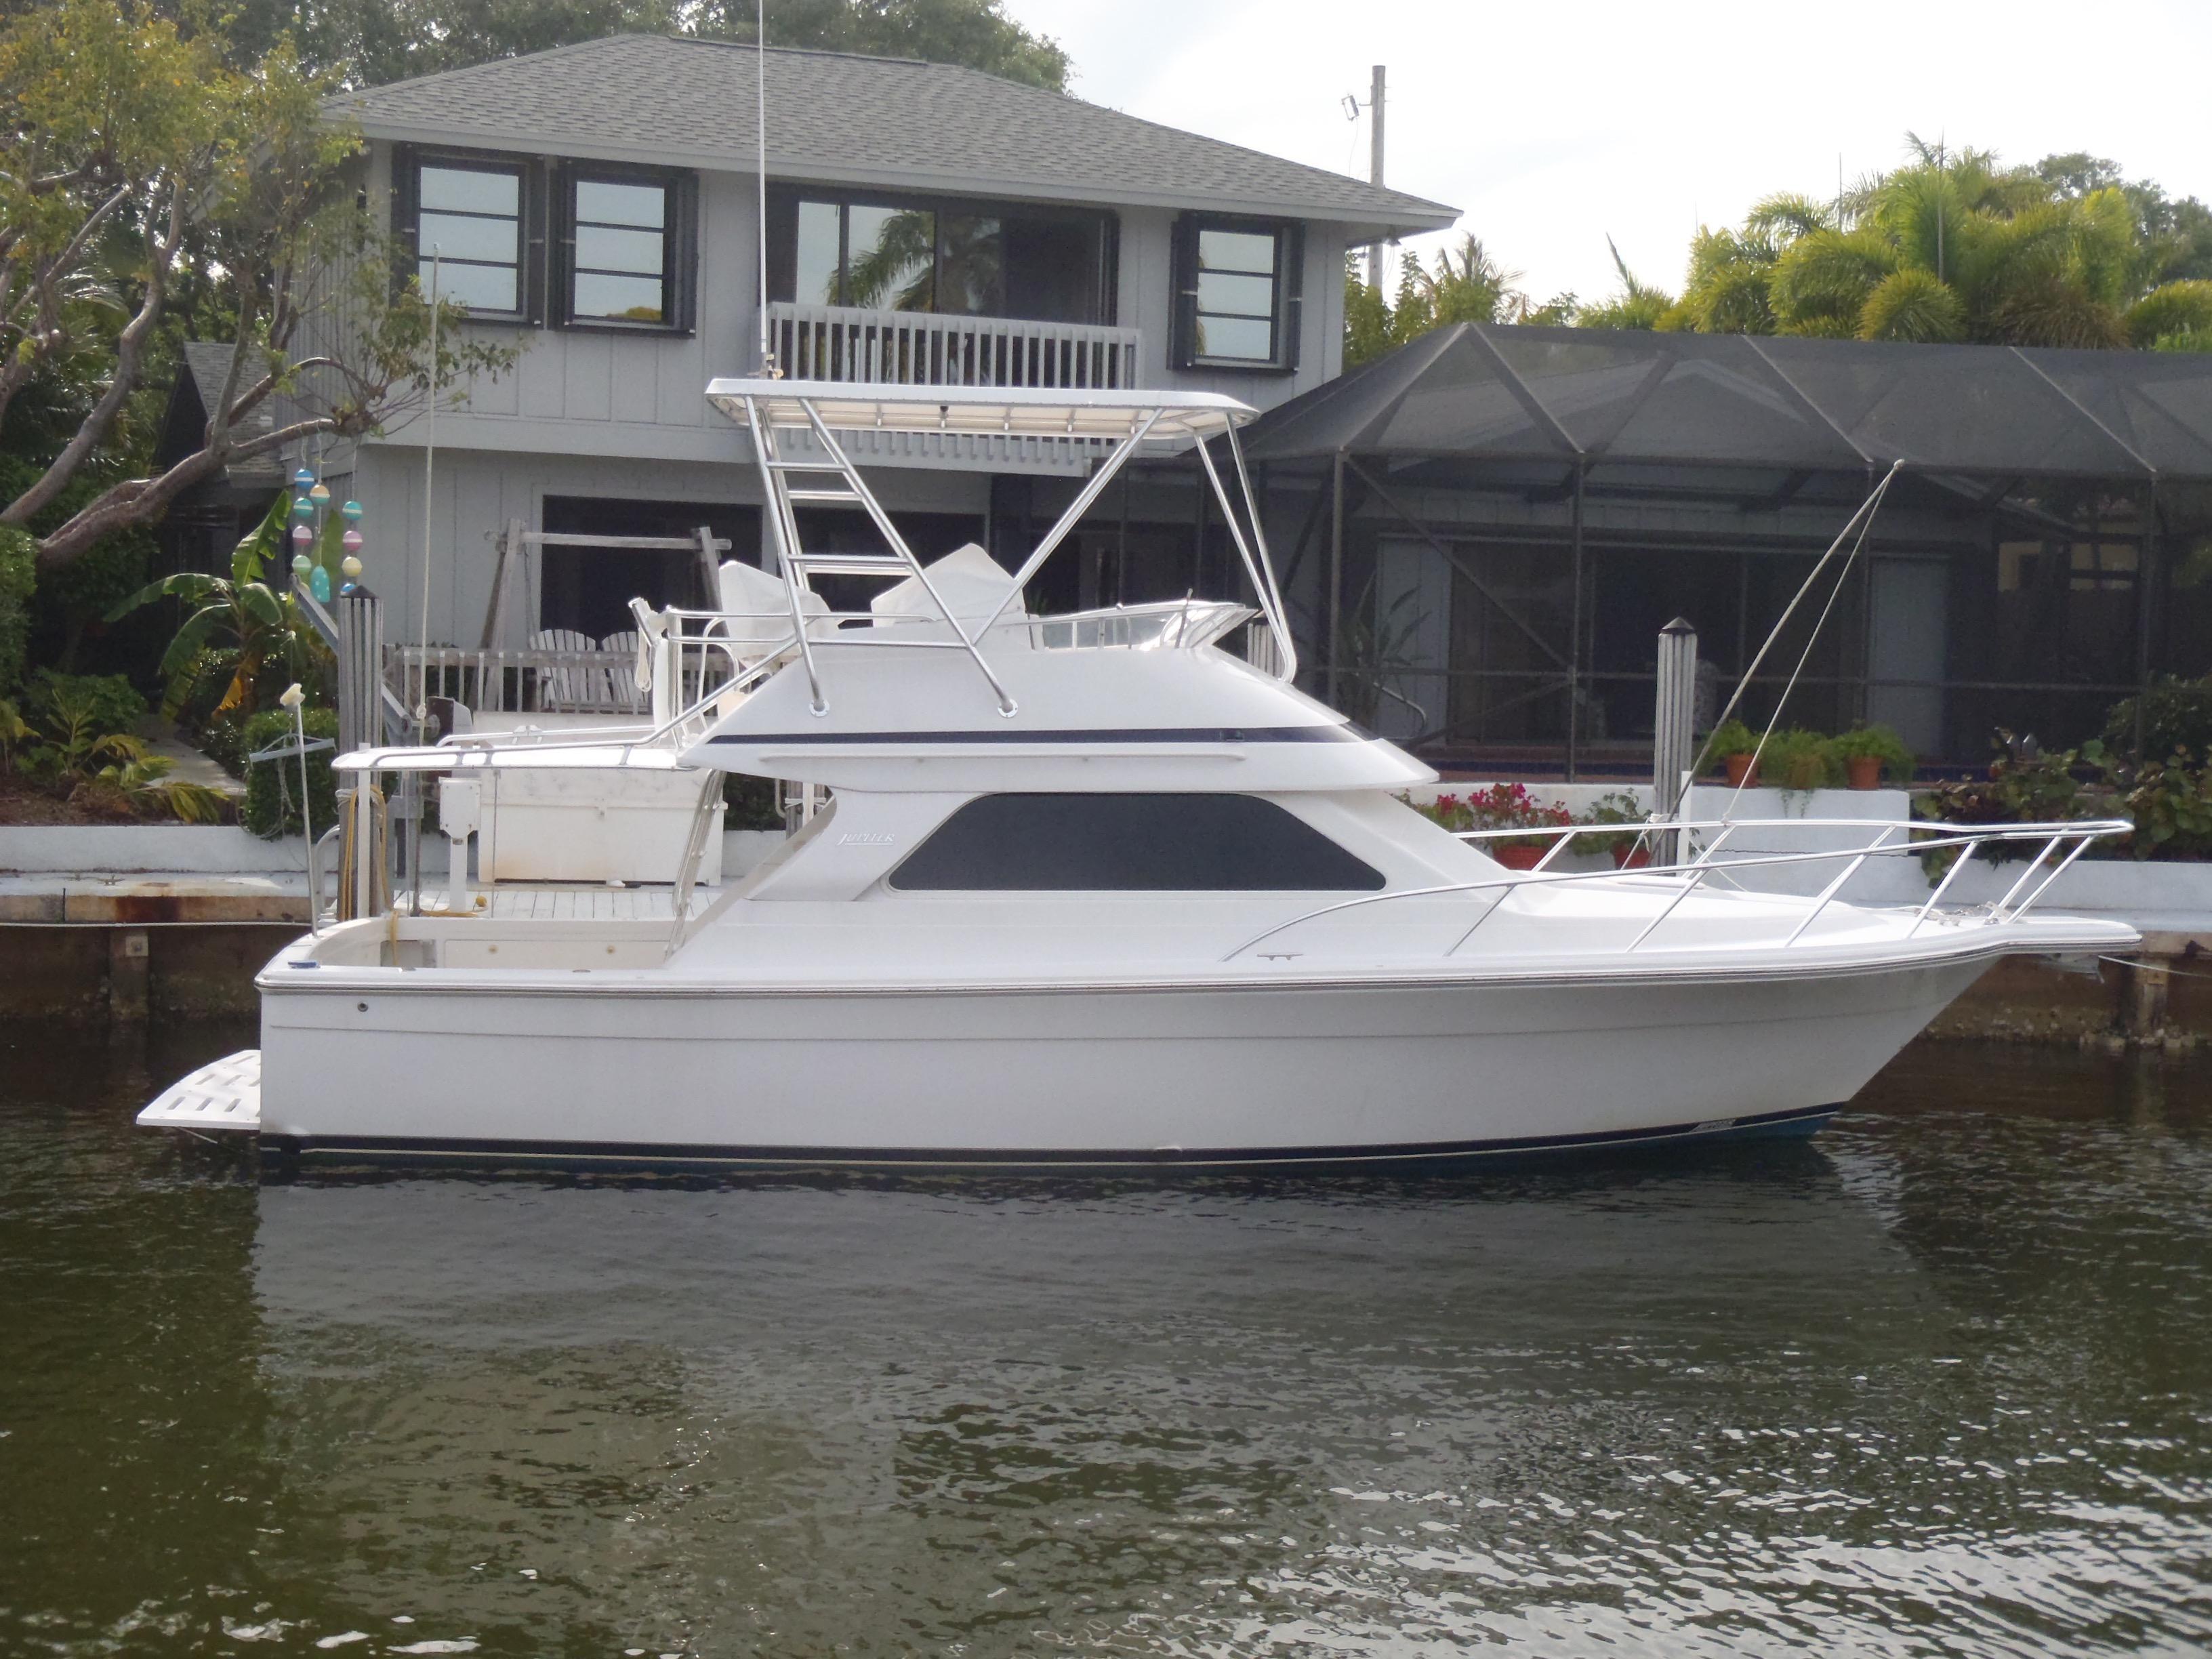 35 Jupiter 2002 Island Woman Jupiter Florida Sold On 2017 05 23 By